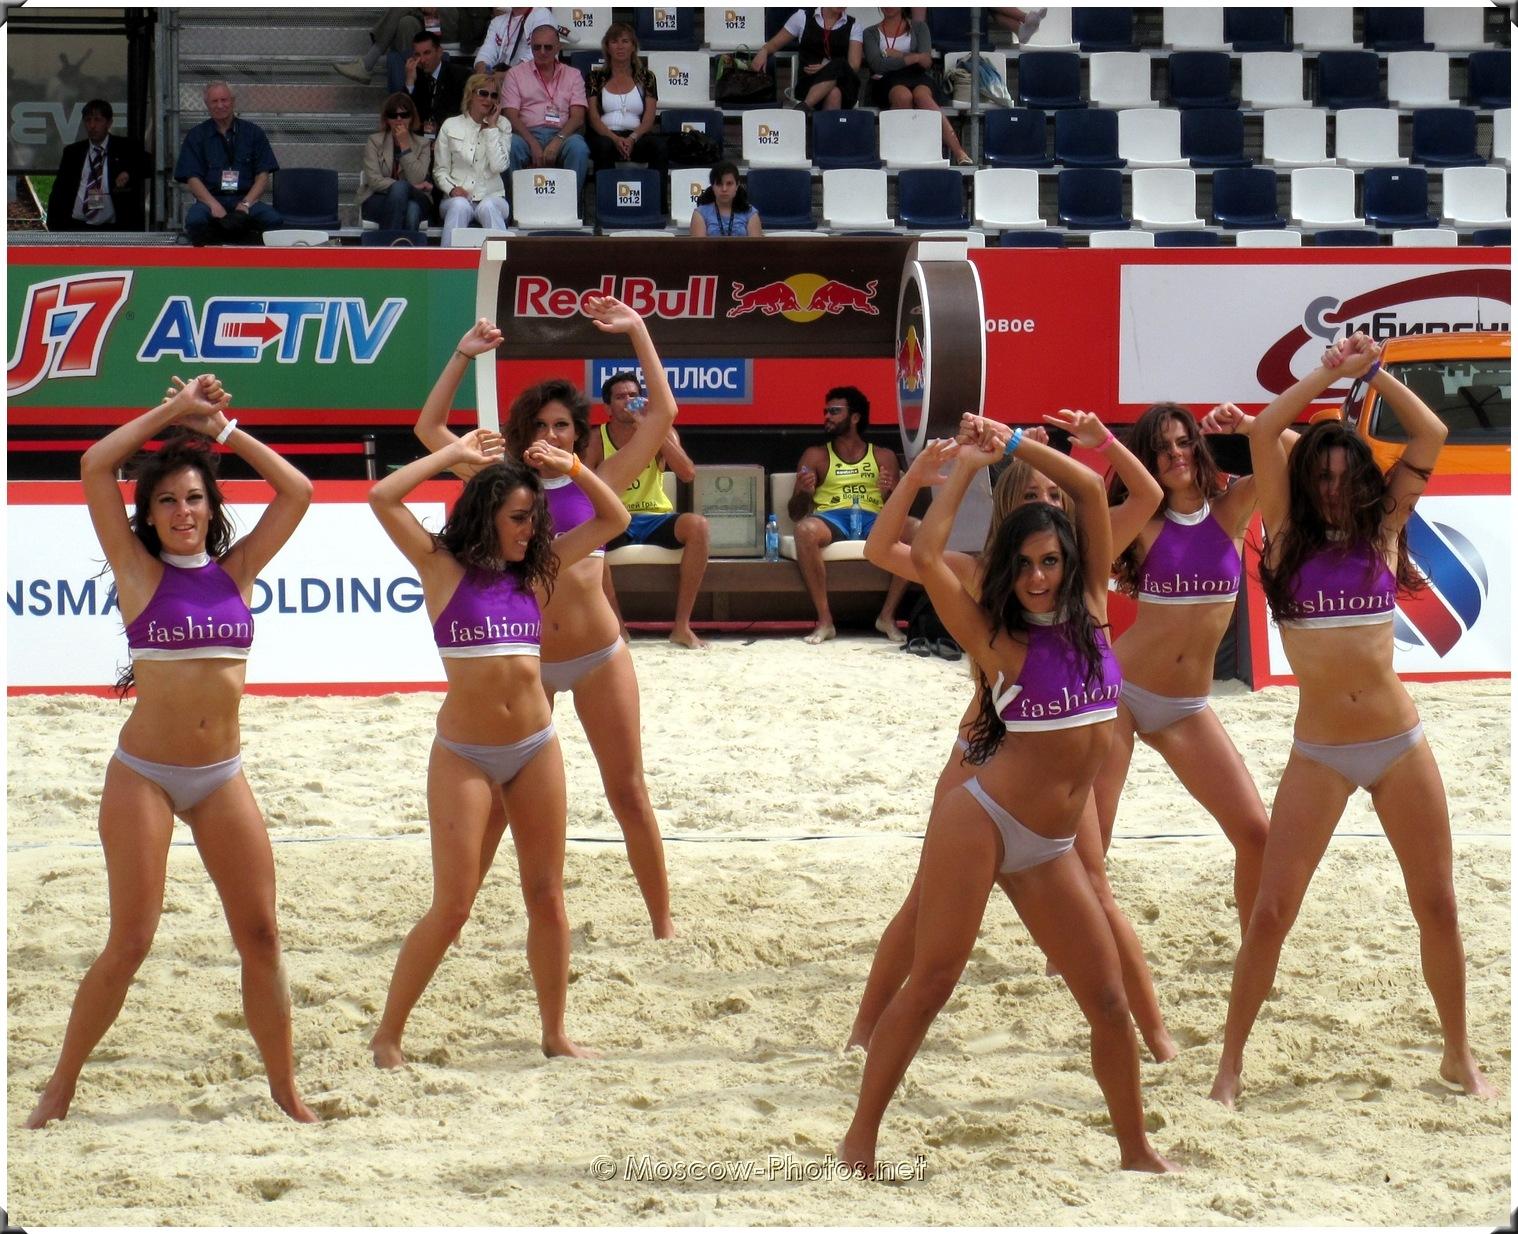 Beach Volleyball Dancing Fashion Tv Bikini Cheerleaders -1298